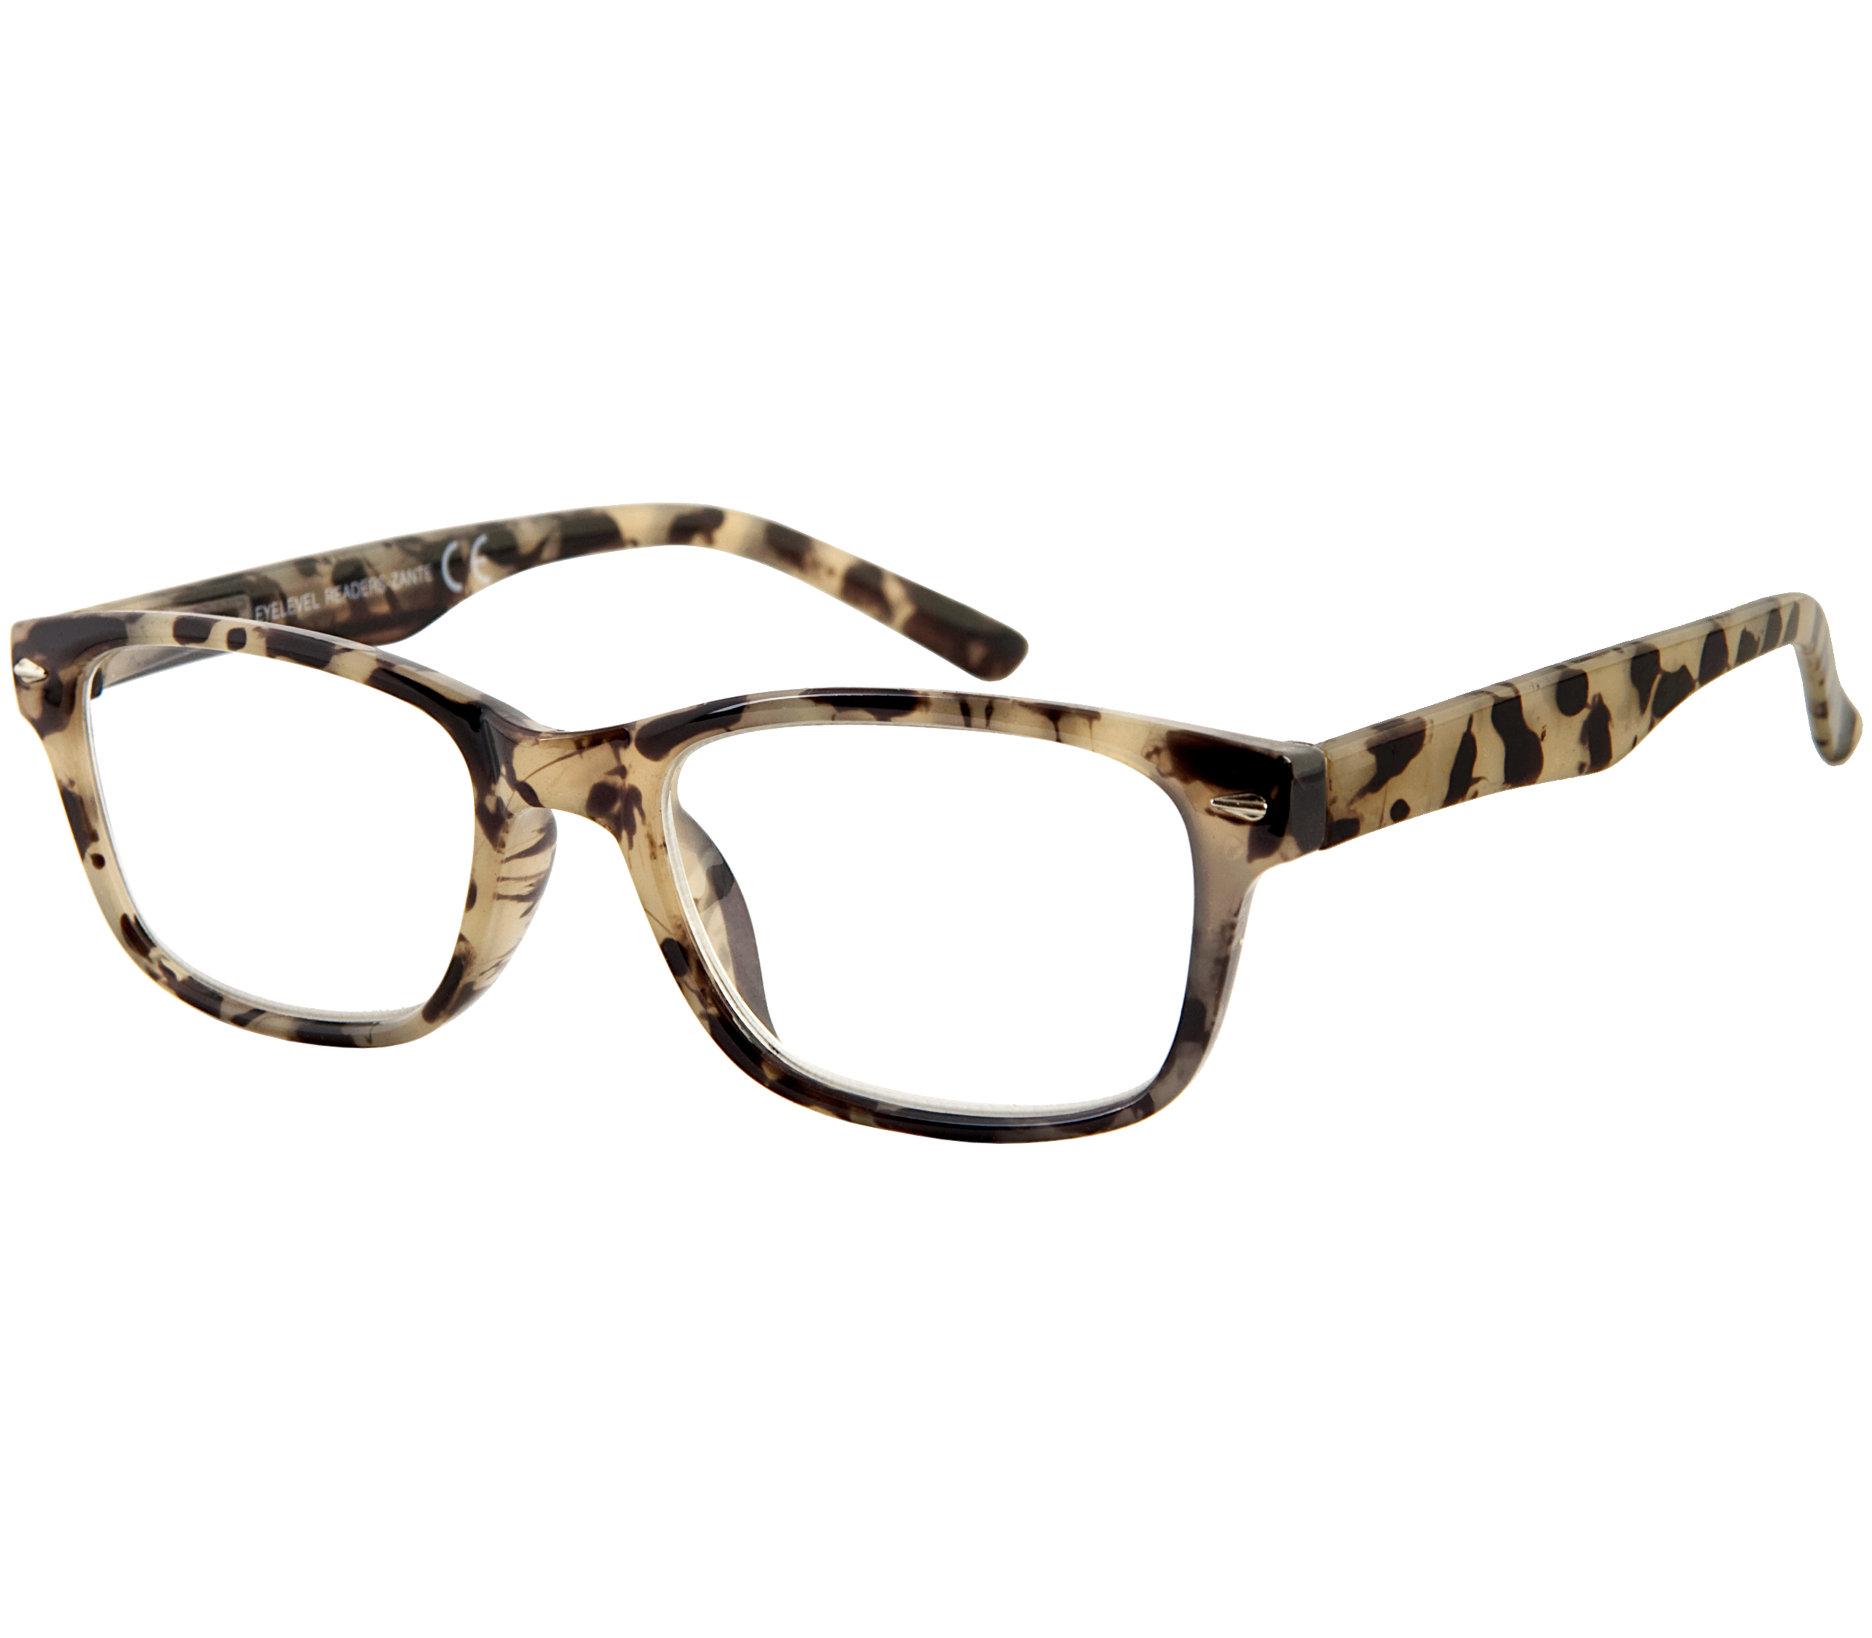 Main Image (Angle) - Zante (Tortoiseshell) Classic Reading Glasses